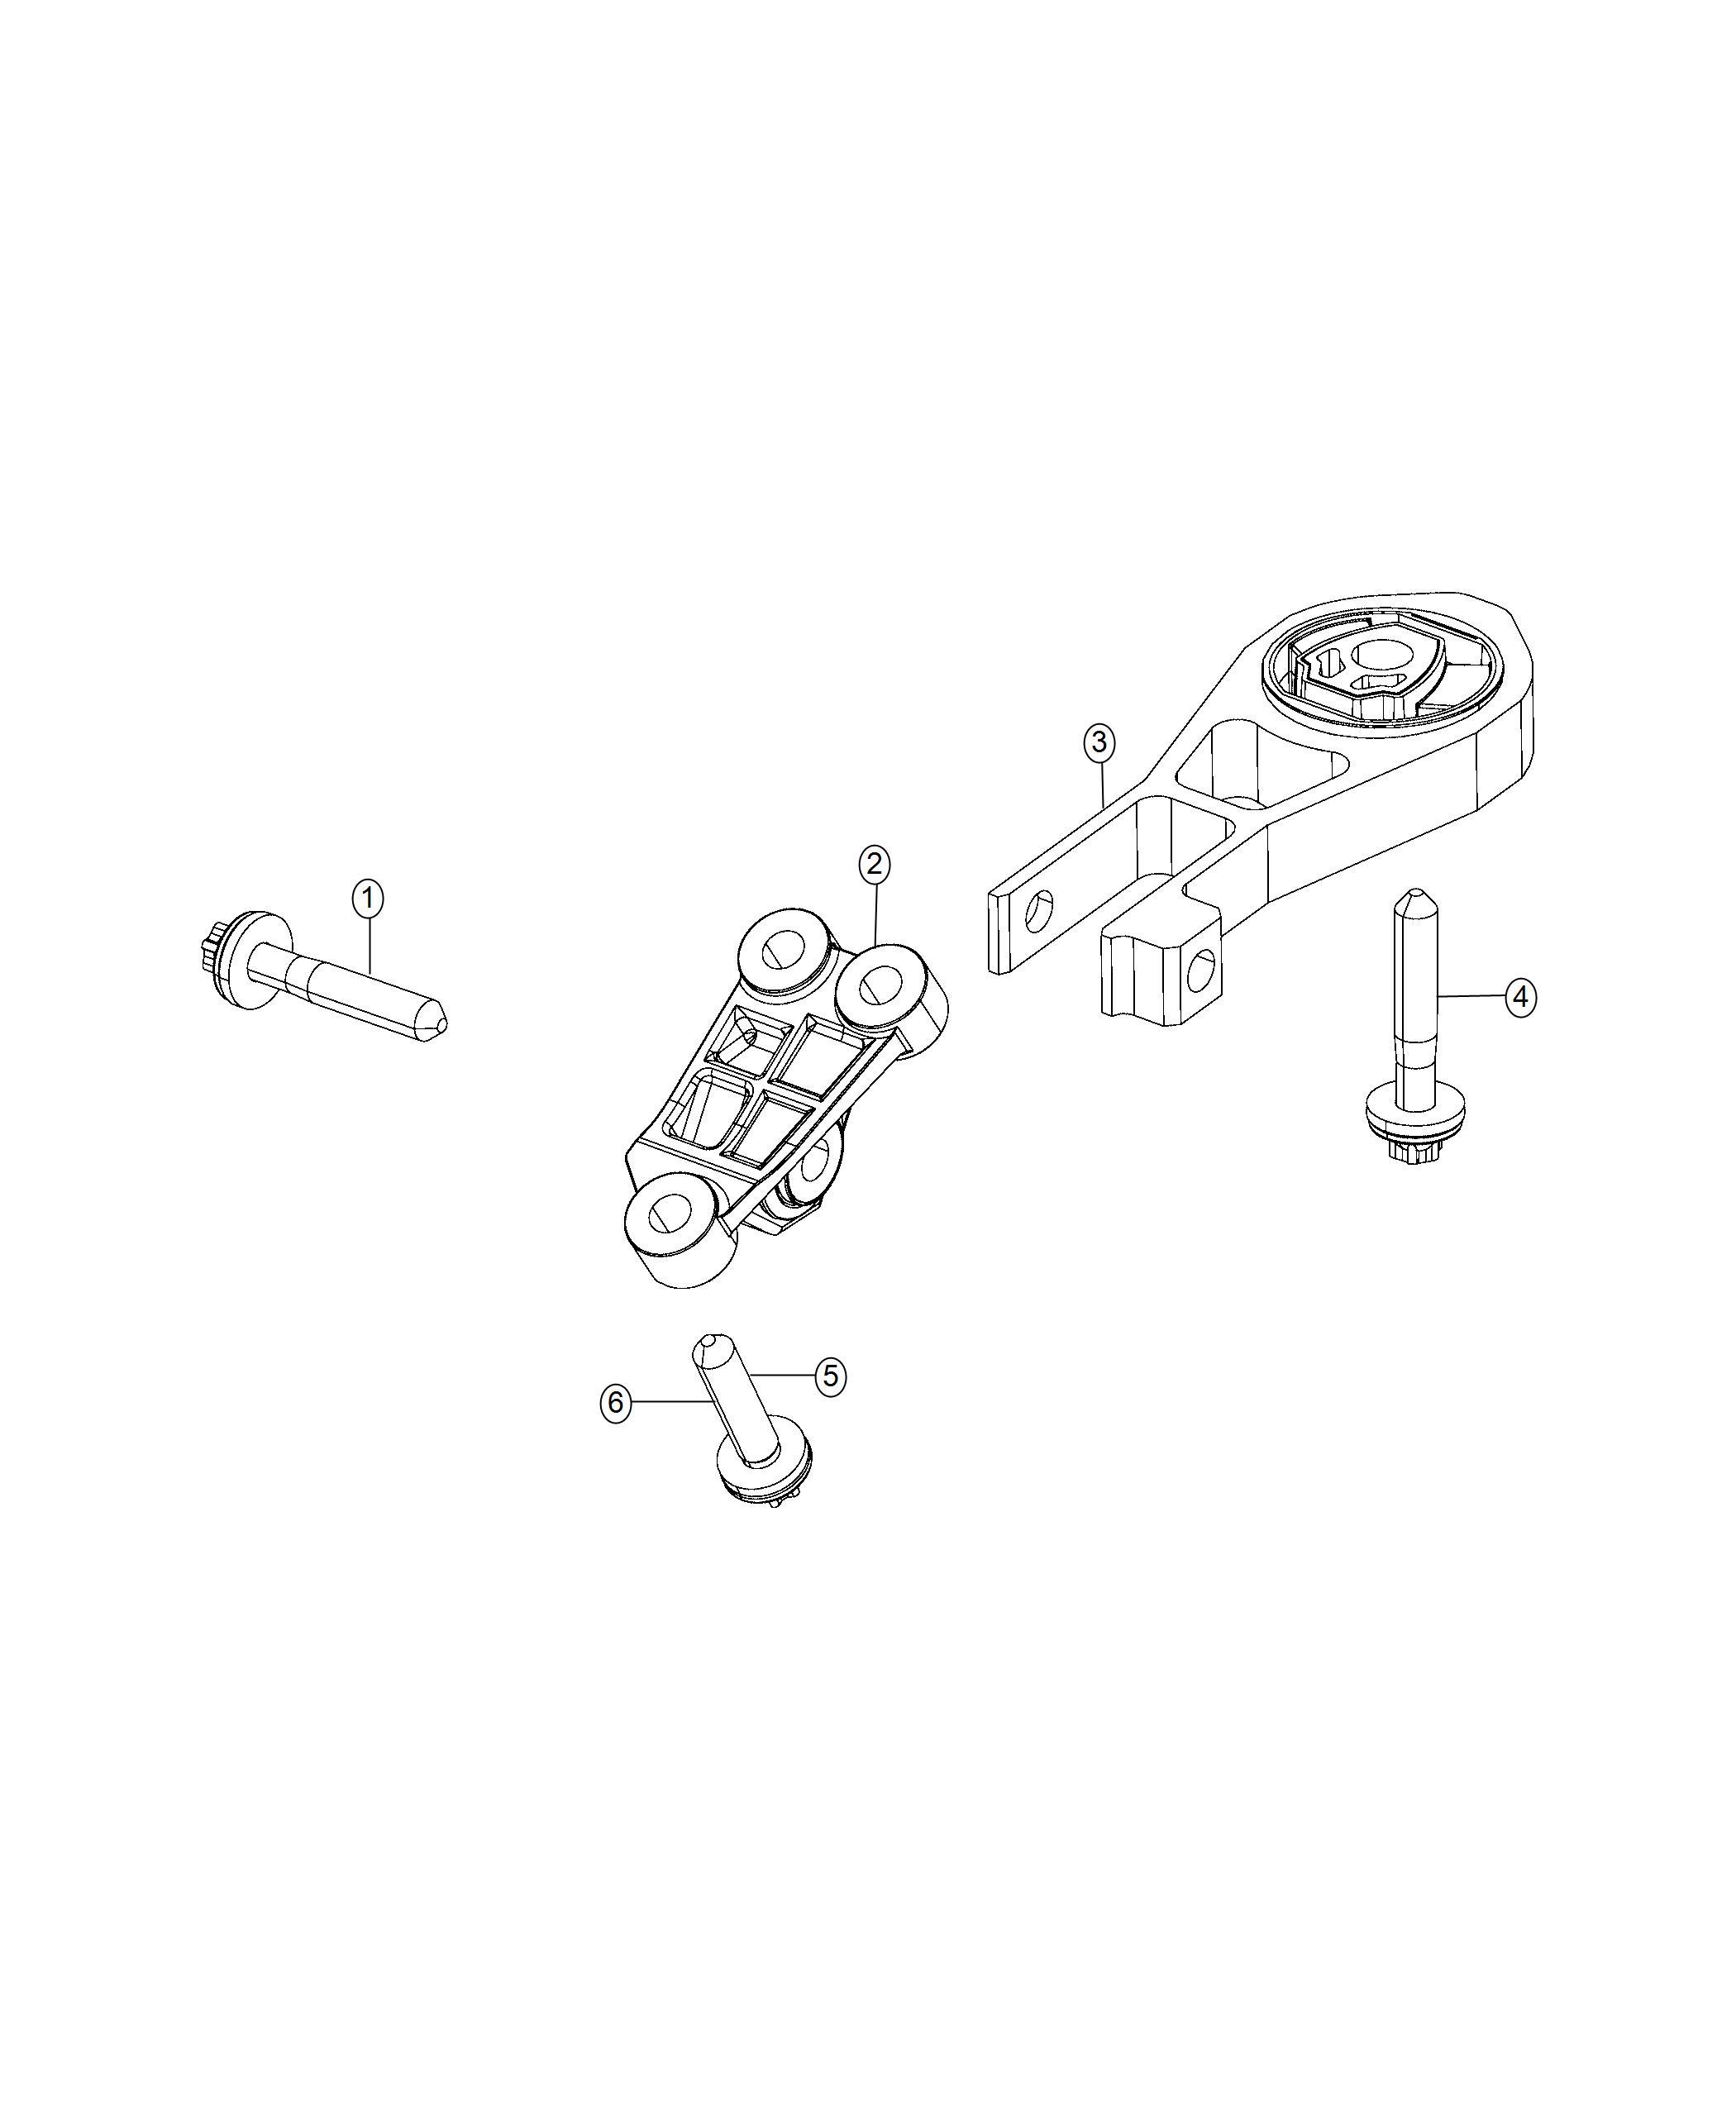 Jeep Compass Bracket. Engine mount. Awd, auto, fwd